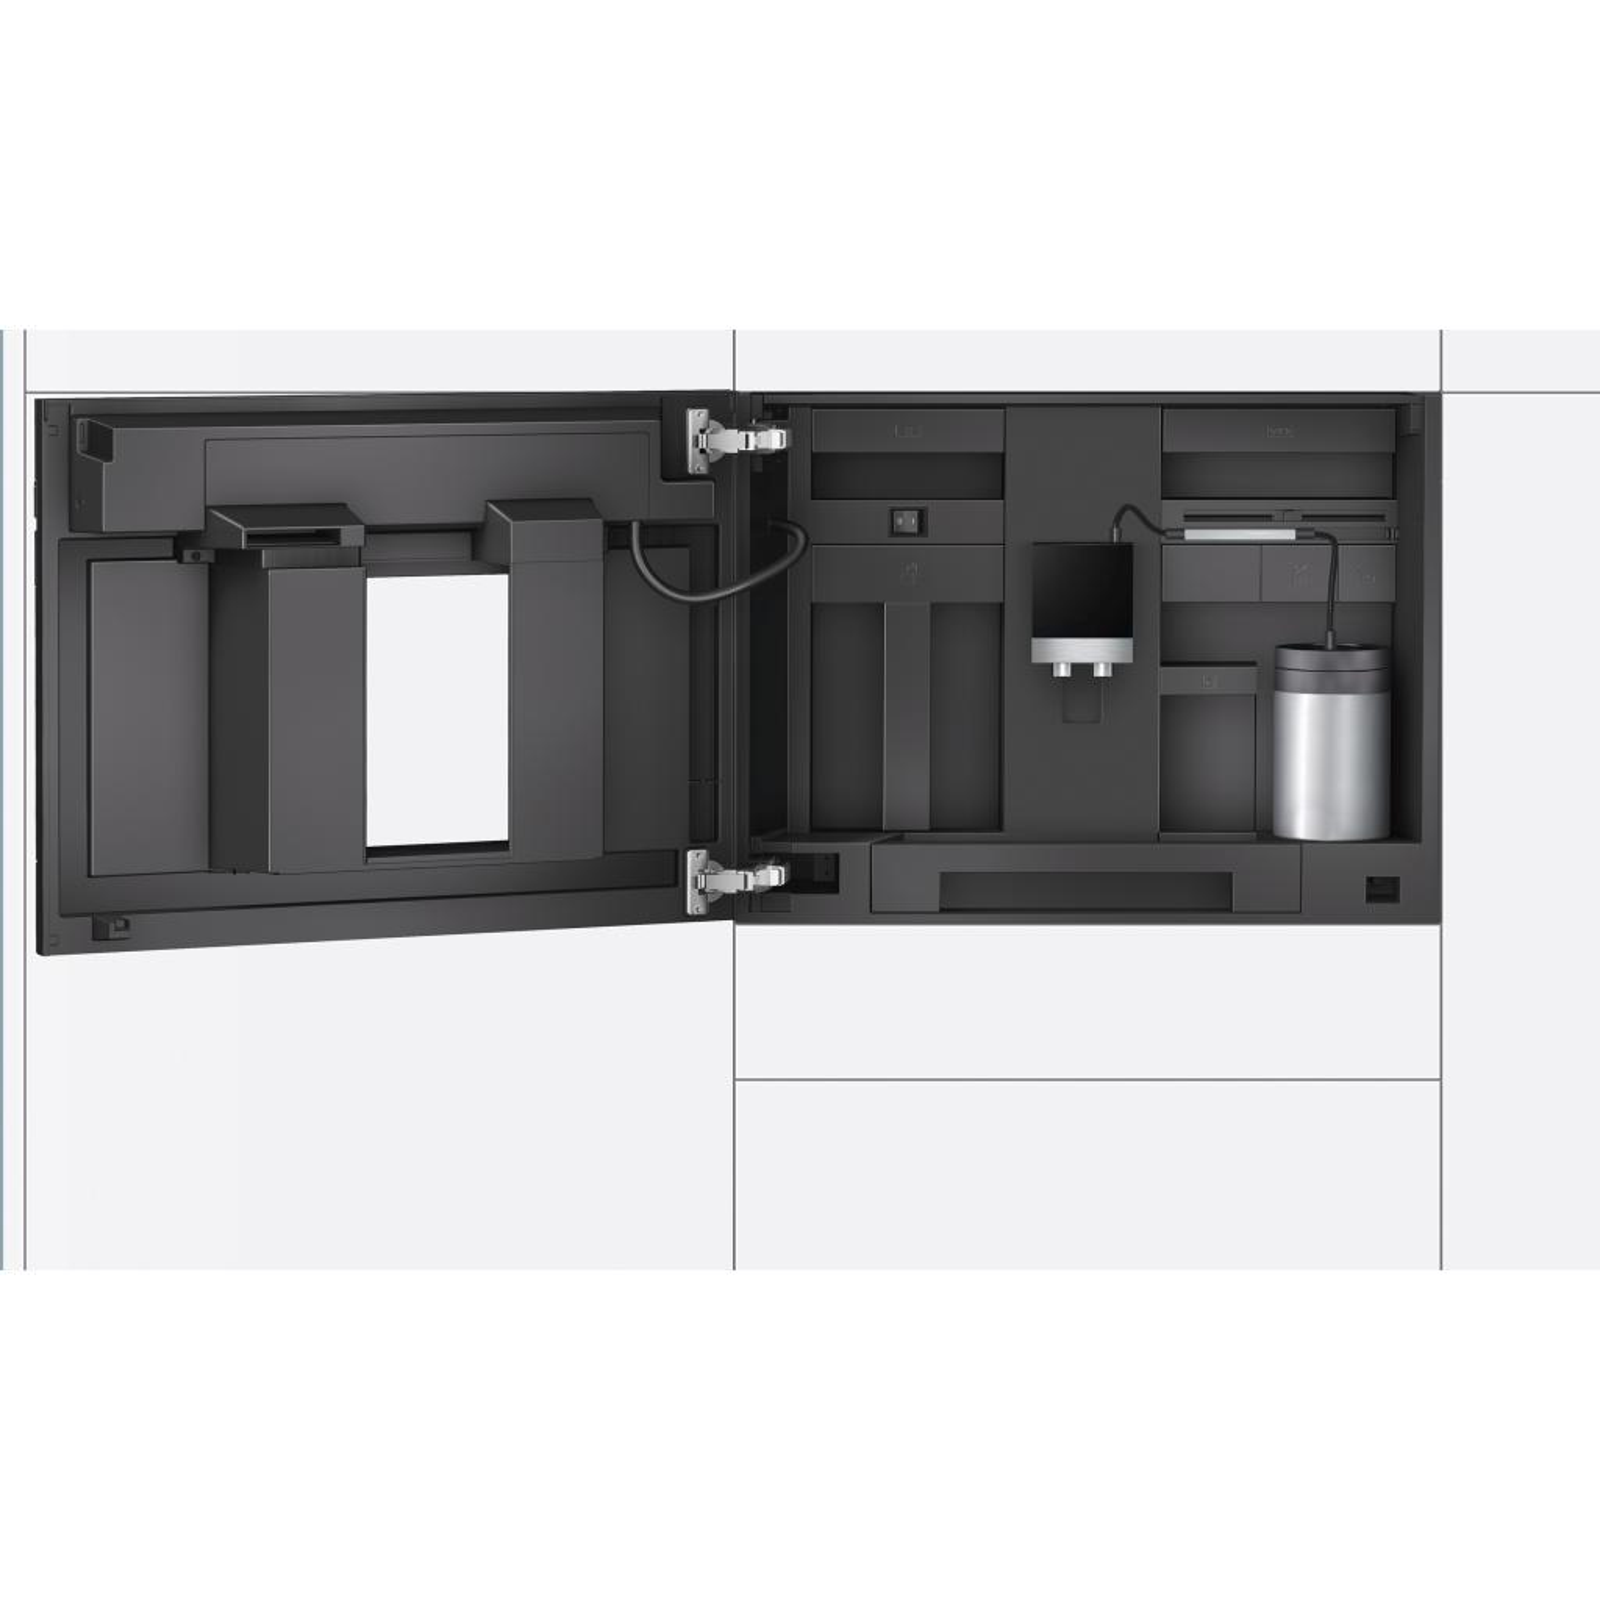 Кофеварка Siemens CT 636 LEW1 (CT636LEW1) изображение 3